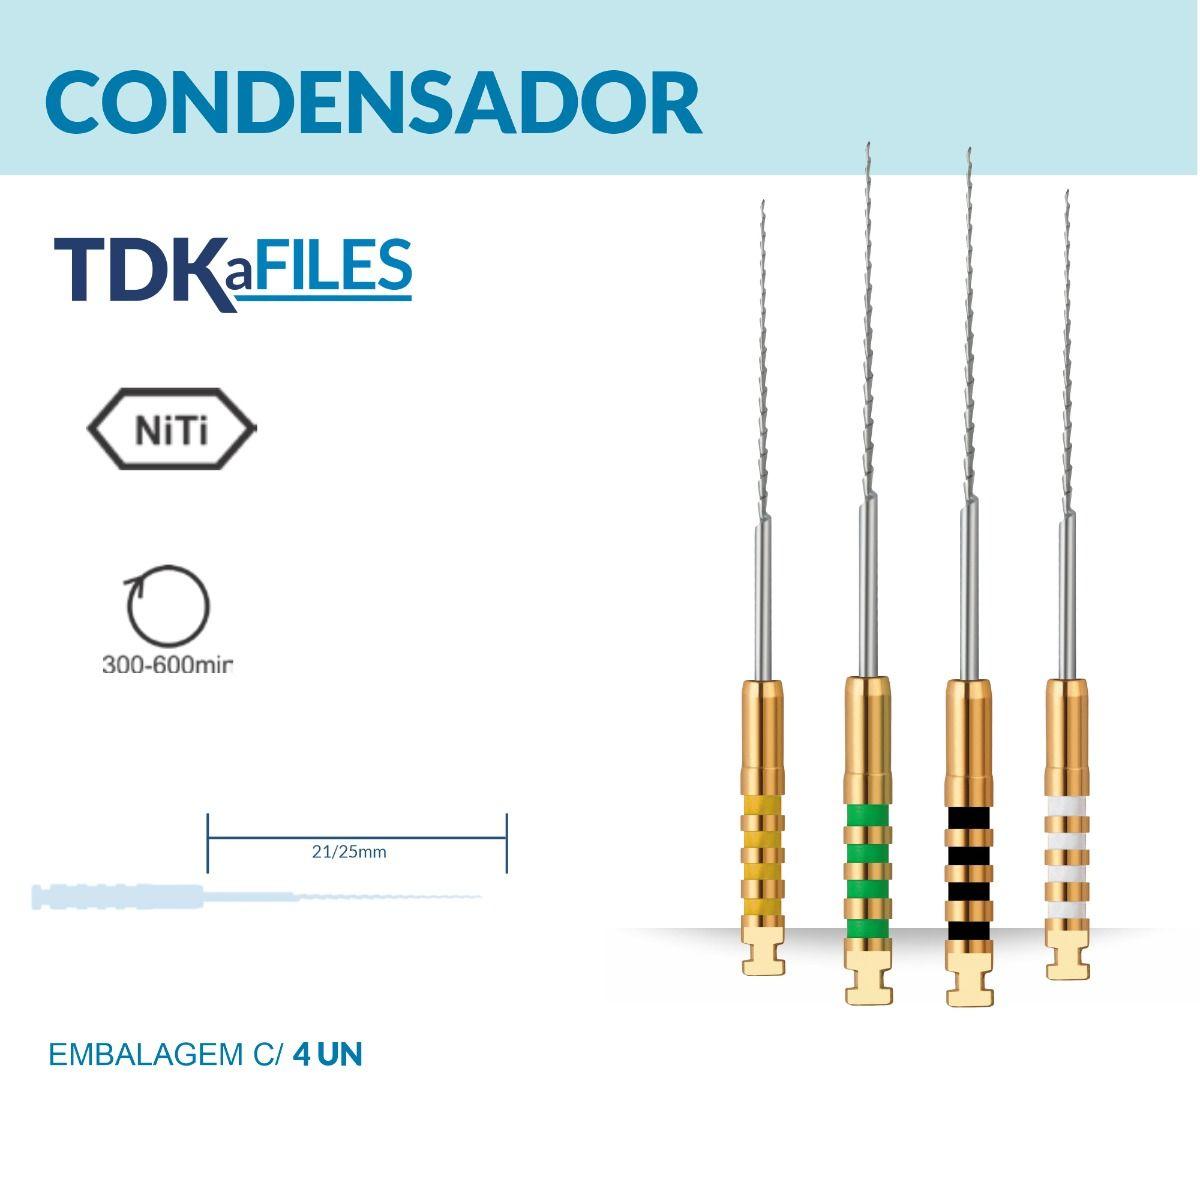 E10 + CONDENSADOR NITI 45 + CONDENSADOR #1